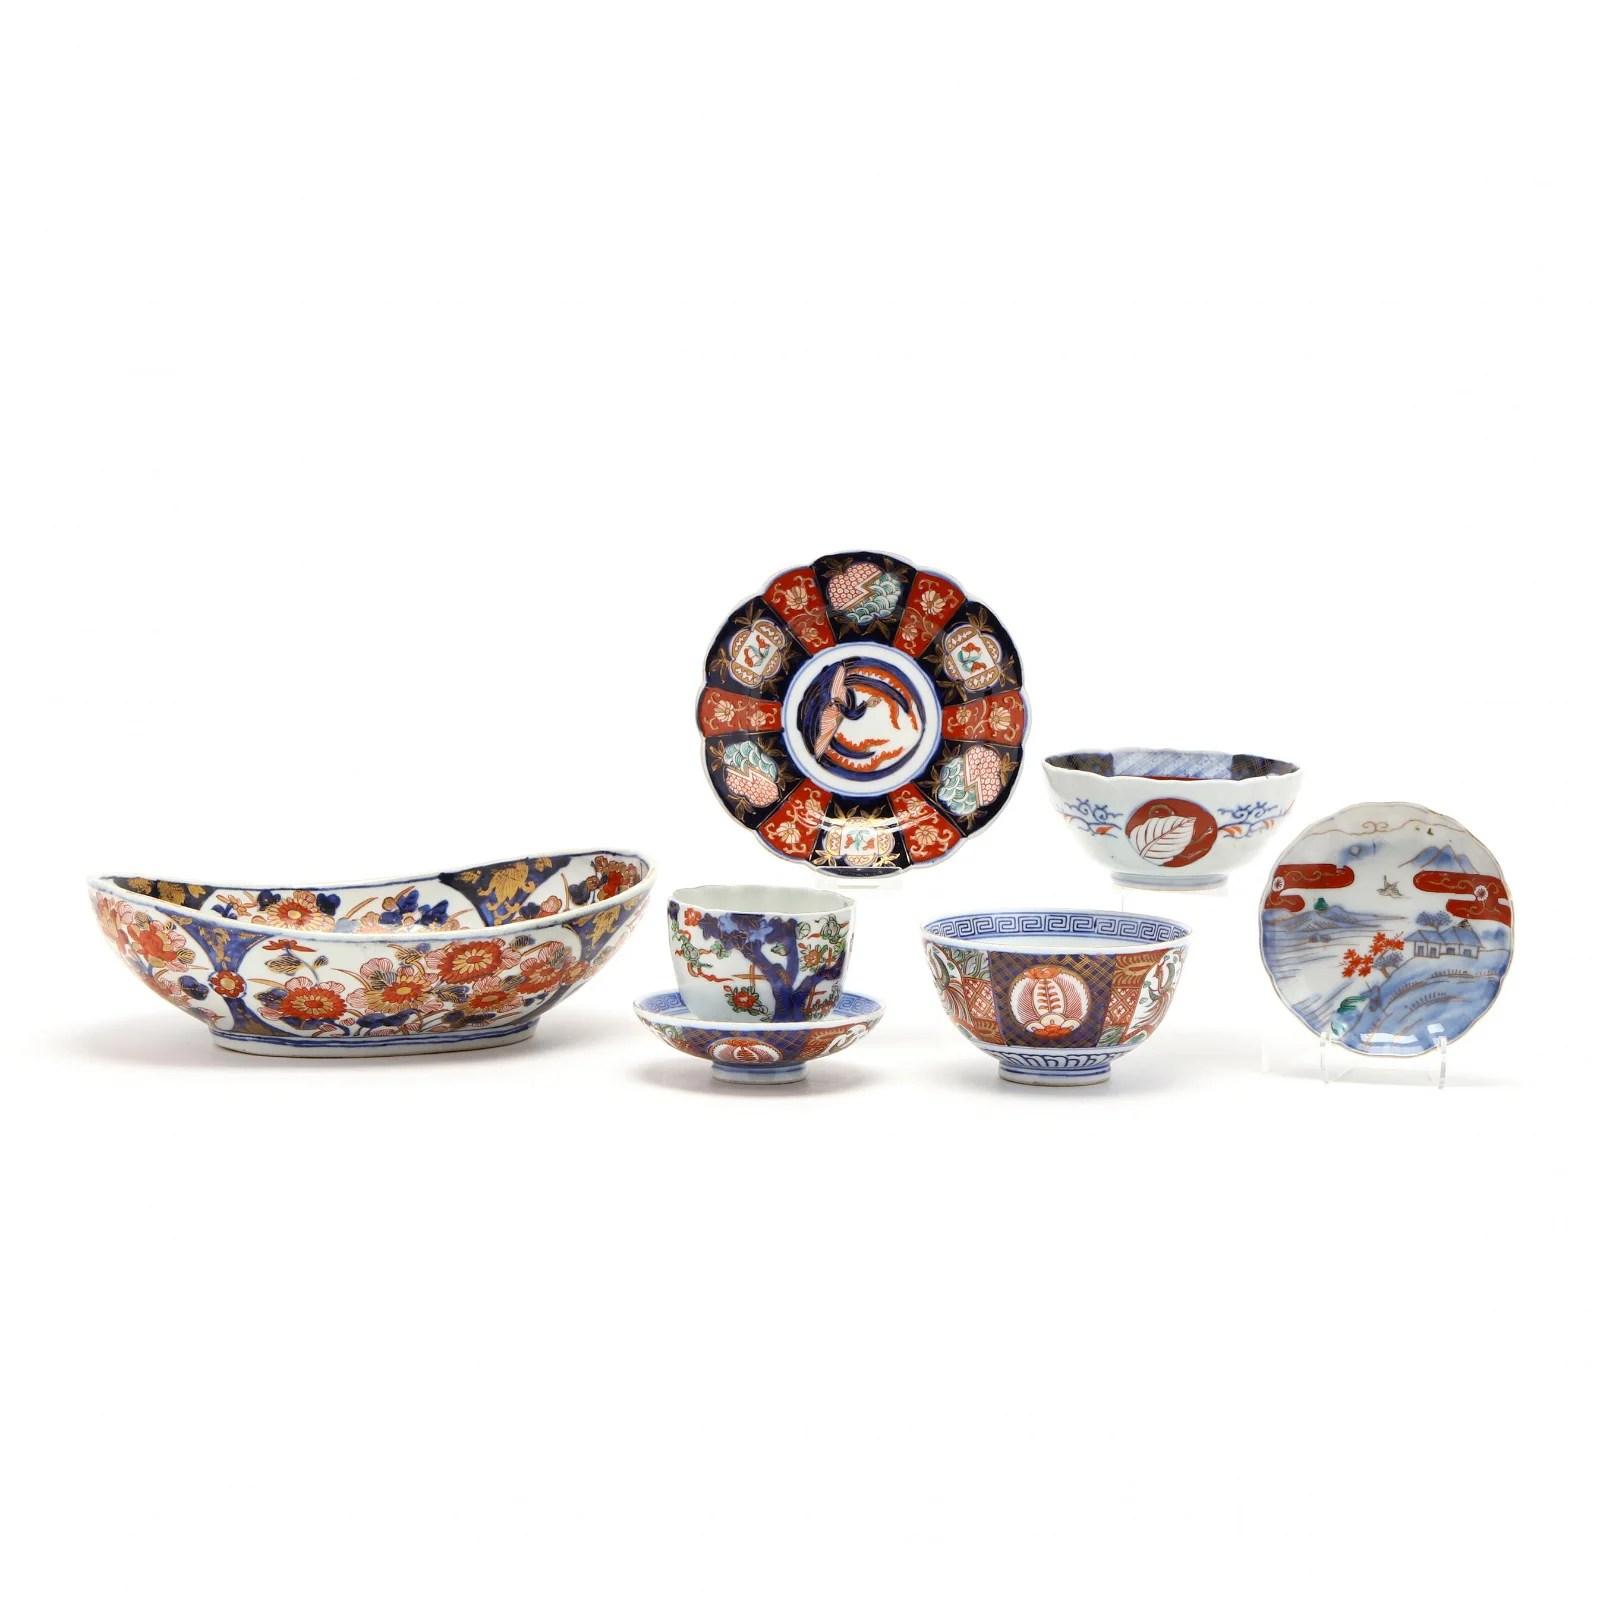 A Group of Japanese Imari Porcelain